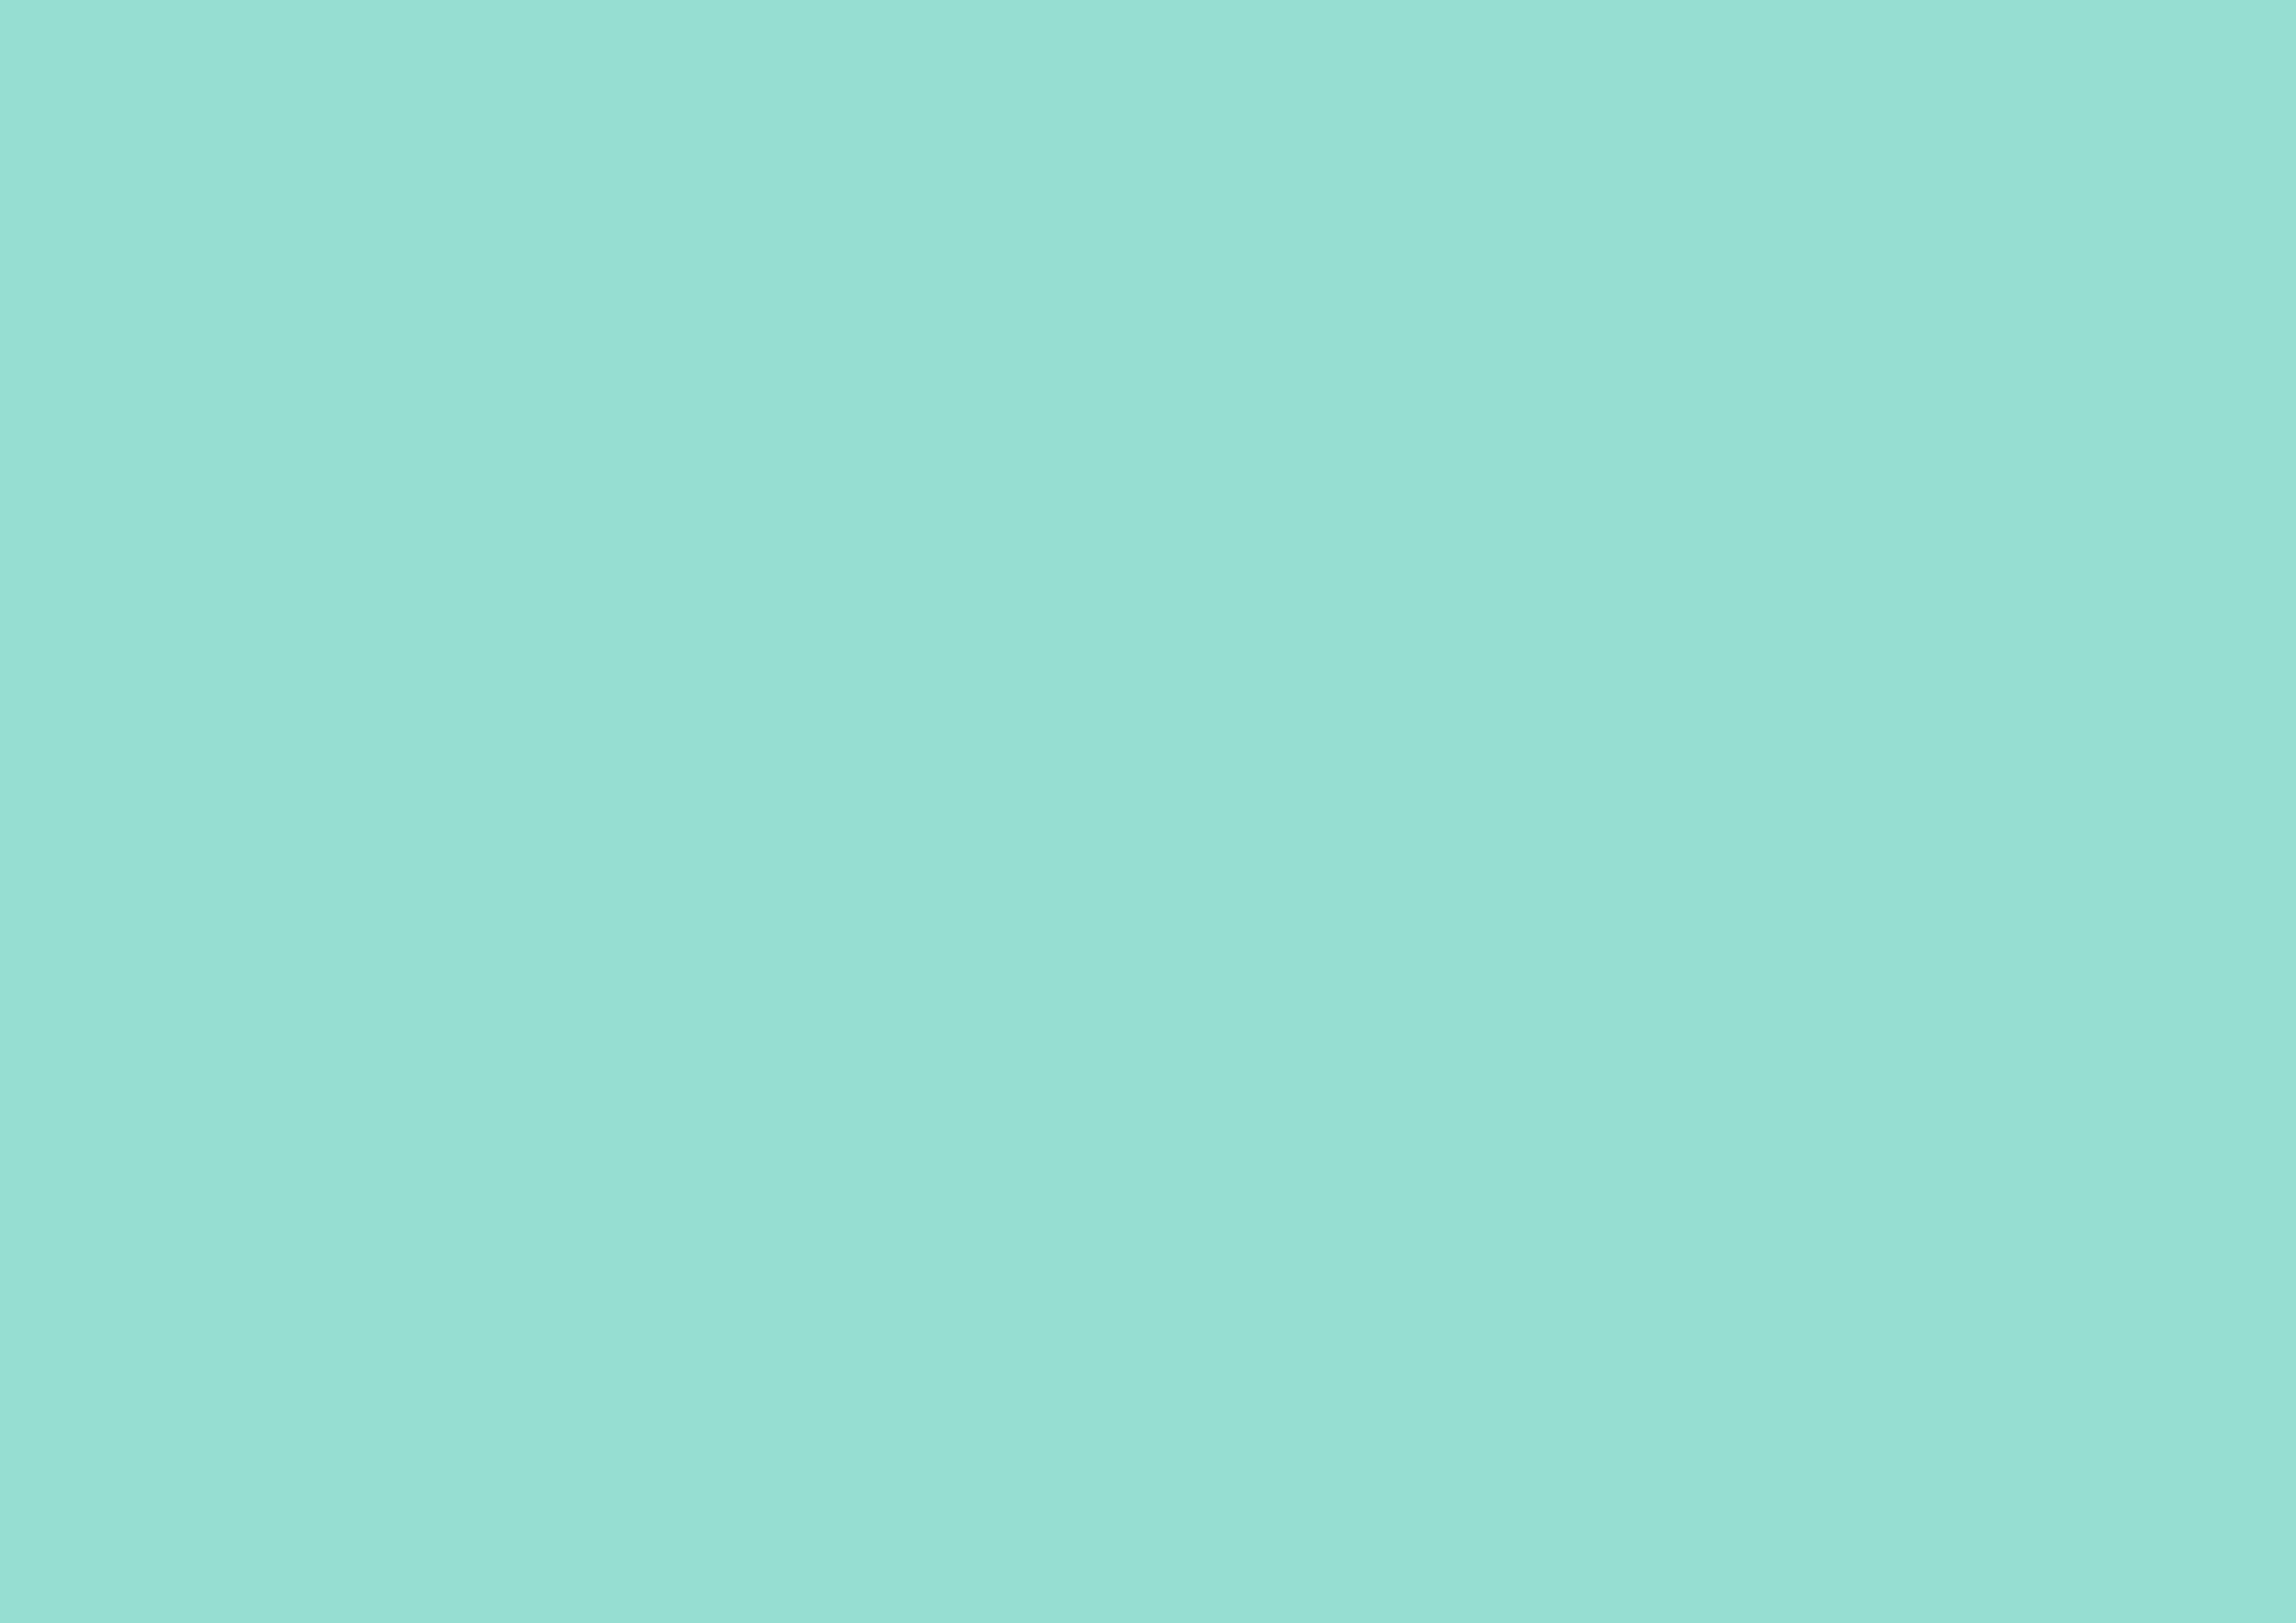 3508x2480 Pale Robin Egg Blue Solid Color Background